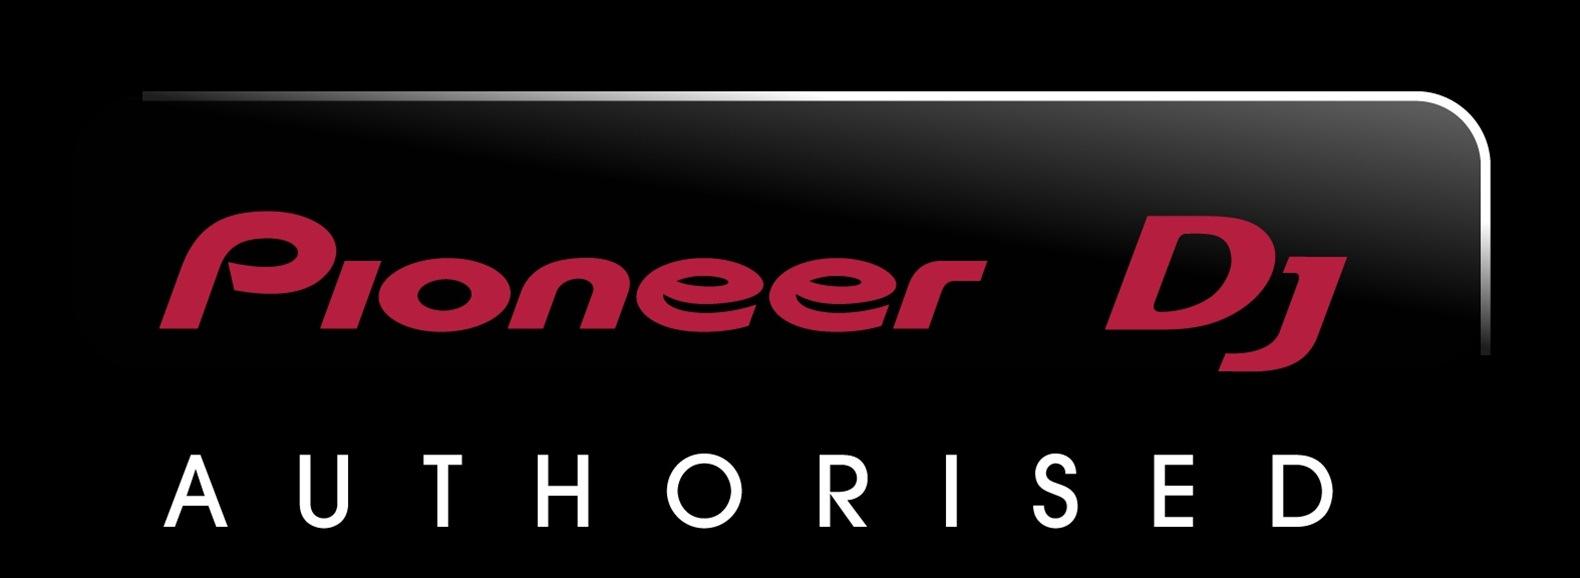 Pioneer Logo pioneer dj logo Logo Database 1580x578